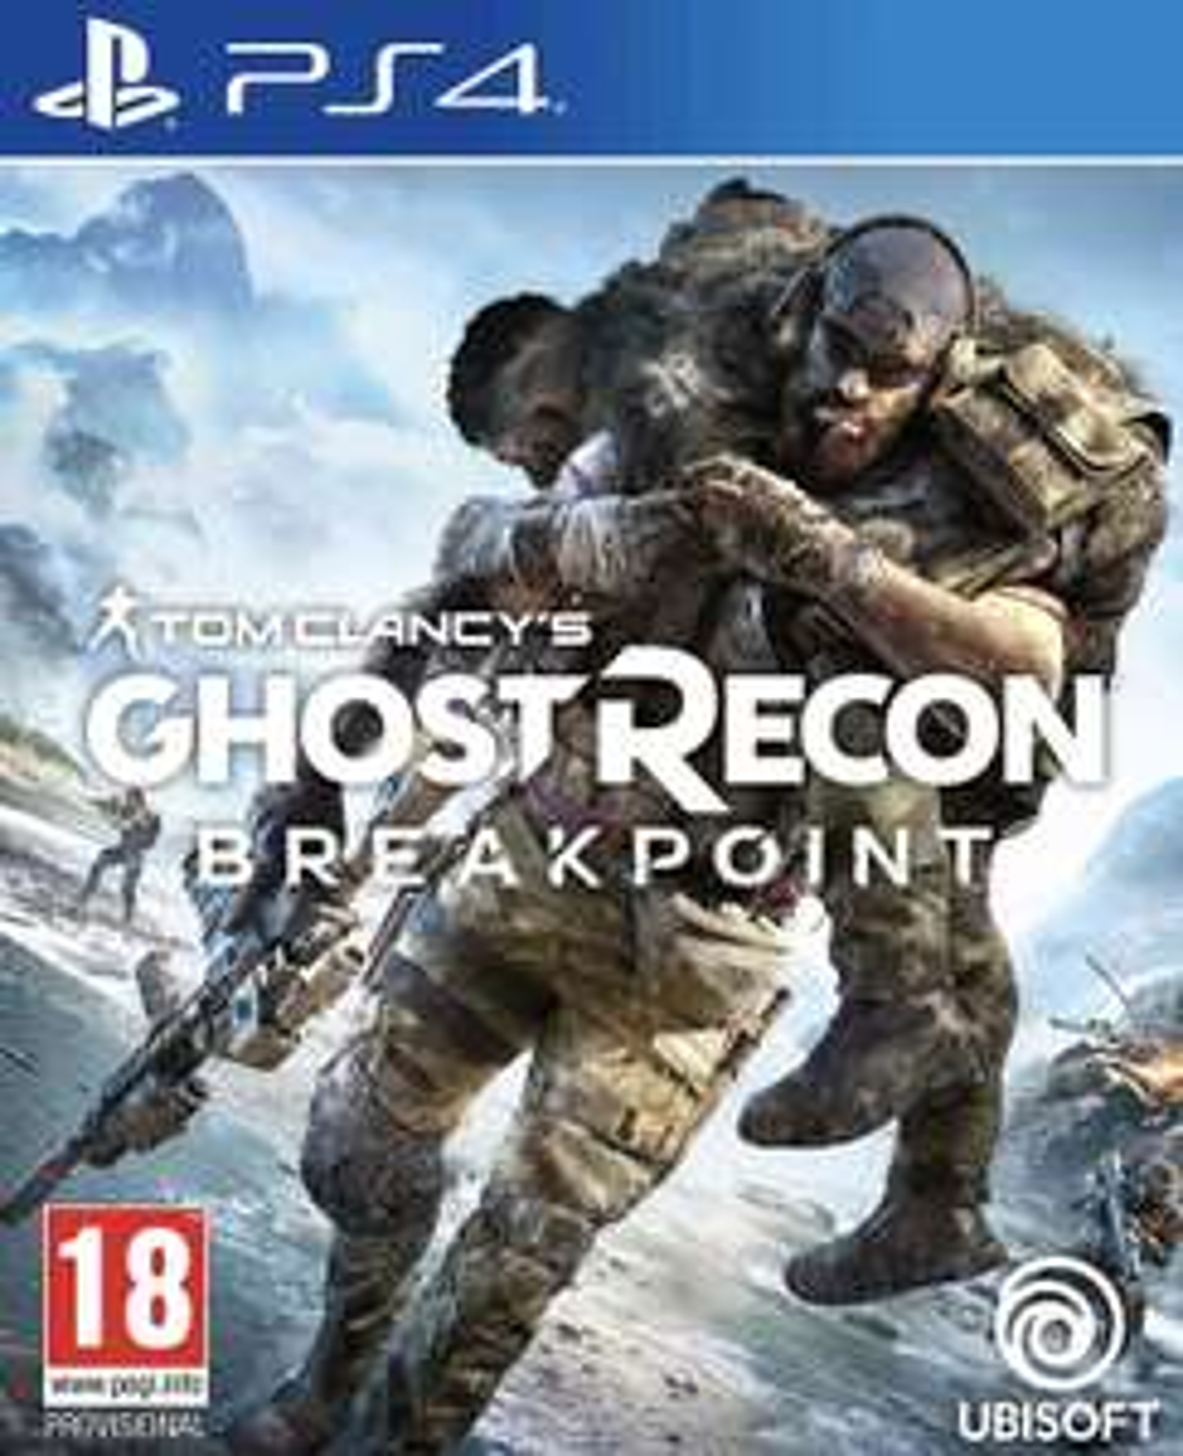 Tom Clancy's Ghost Recon: Breakpoint (PS4) (Ex-rental) £15.99 @ boomerang rentals via eBay